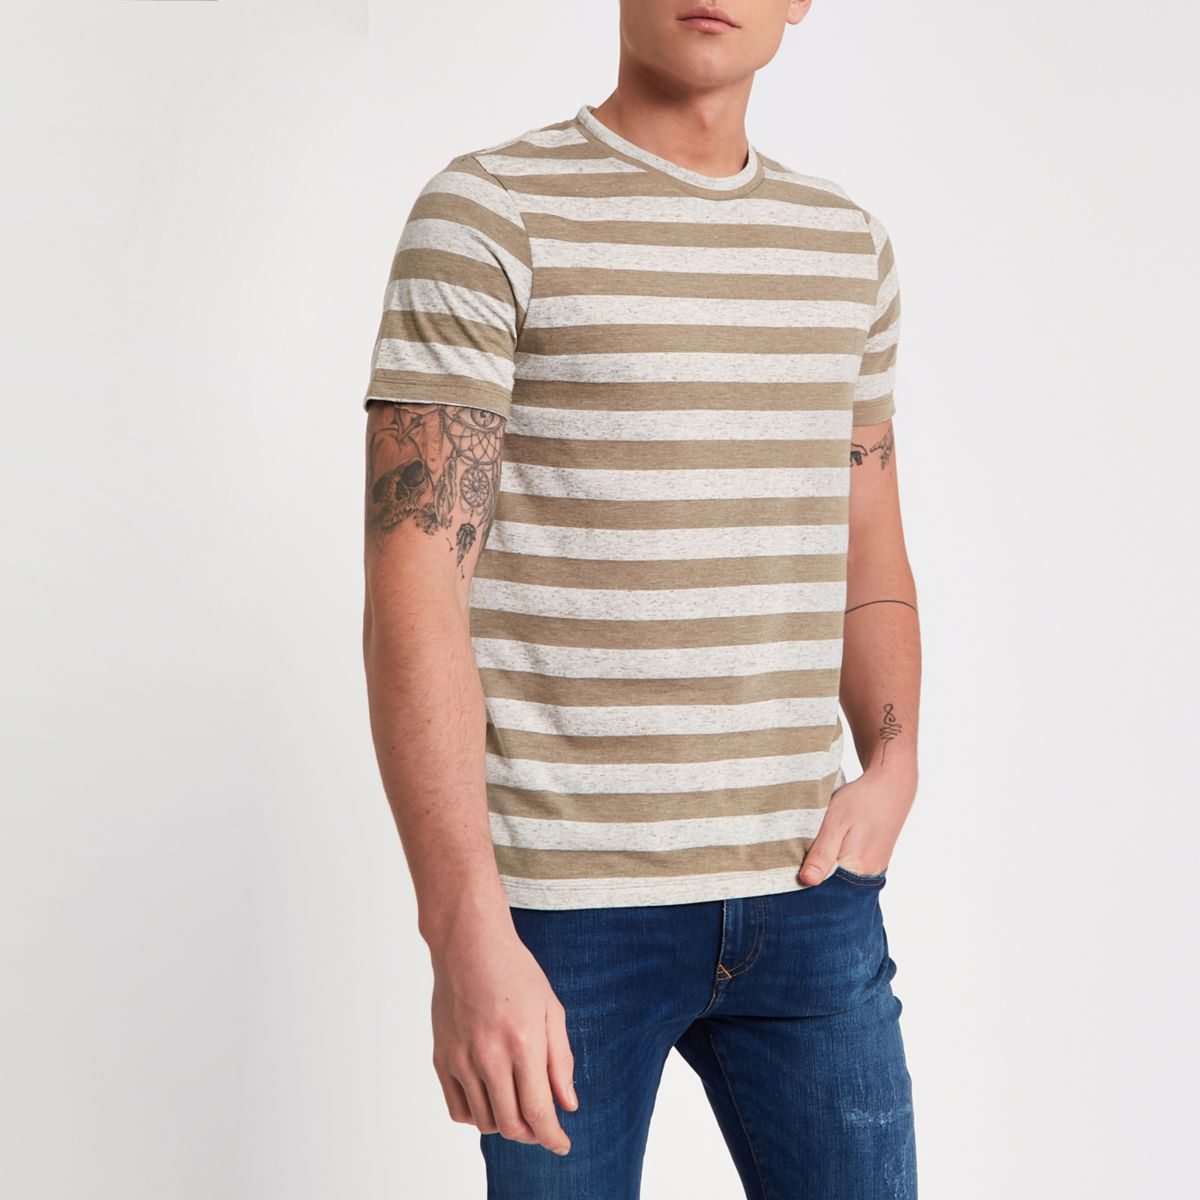 Jack & Jones brown stripe T-shirt